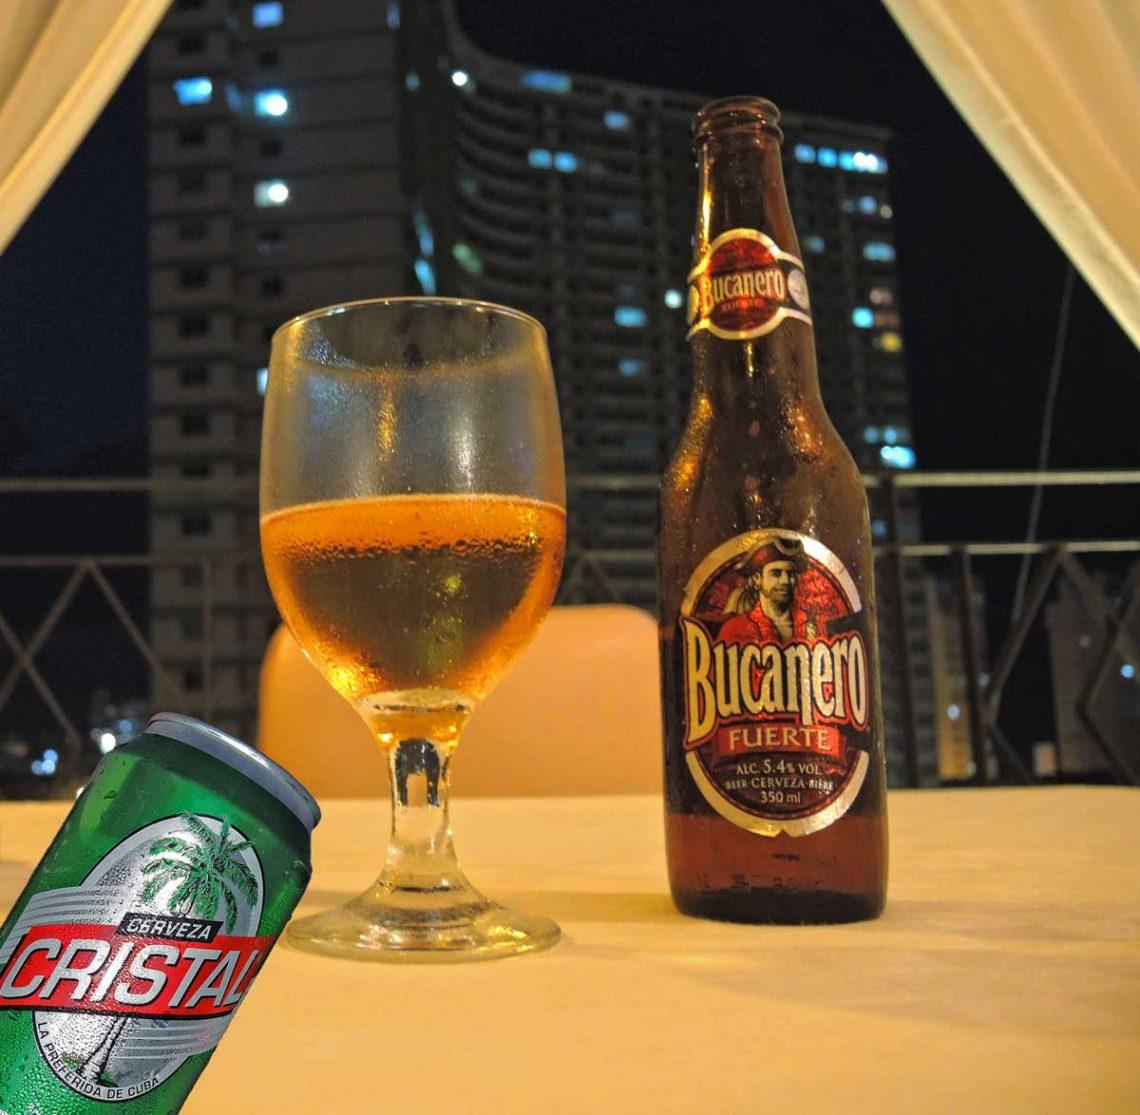 Kubanews: Bier Bucanero oder Cristal